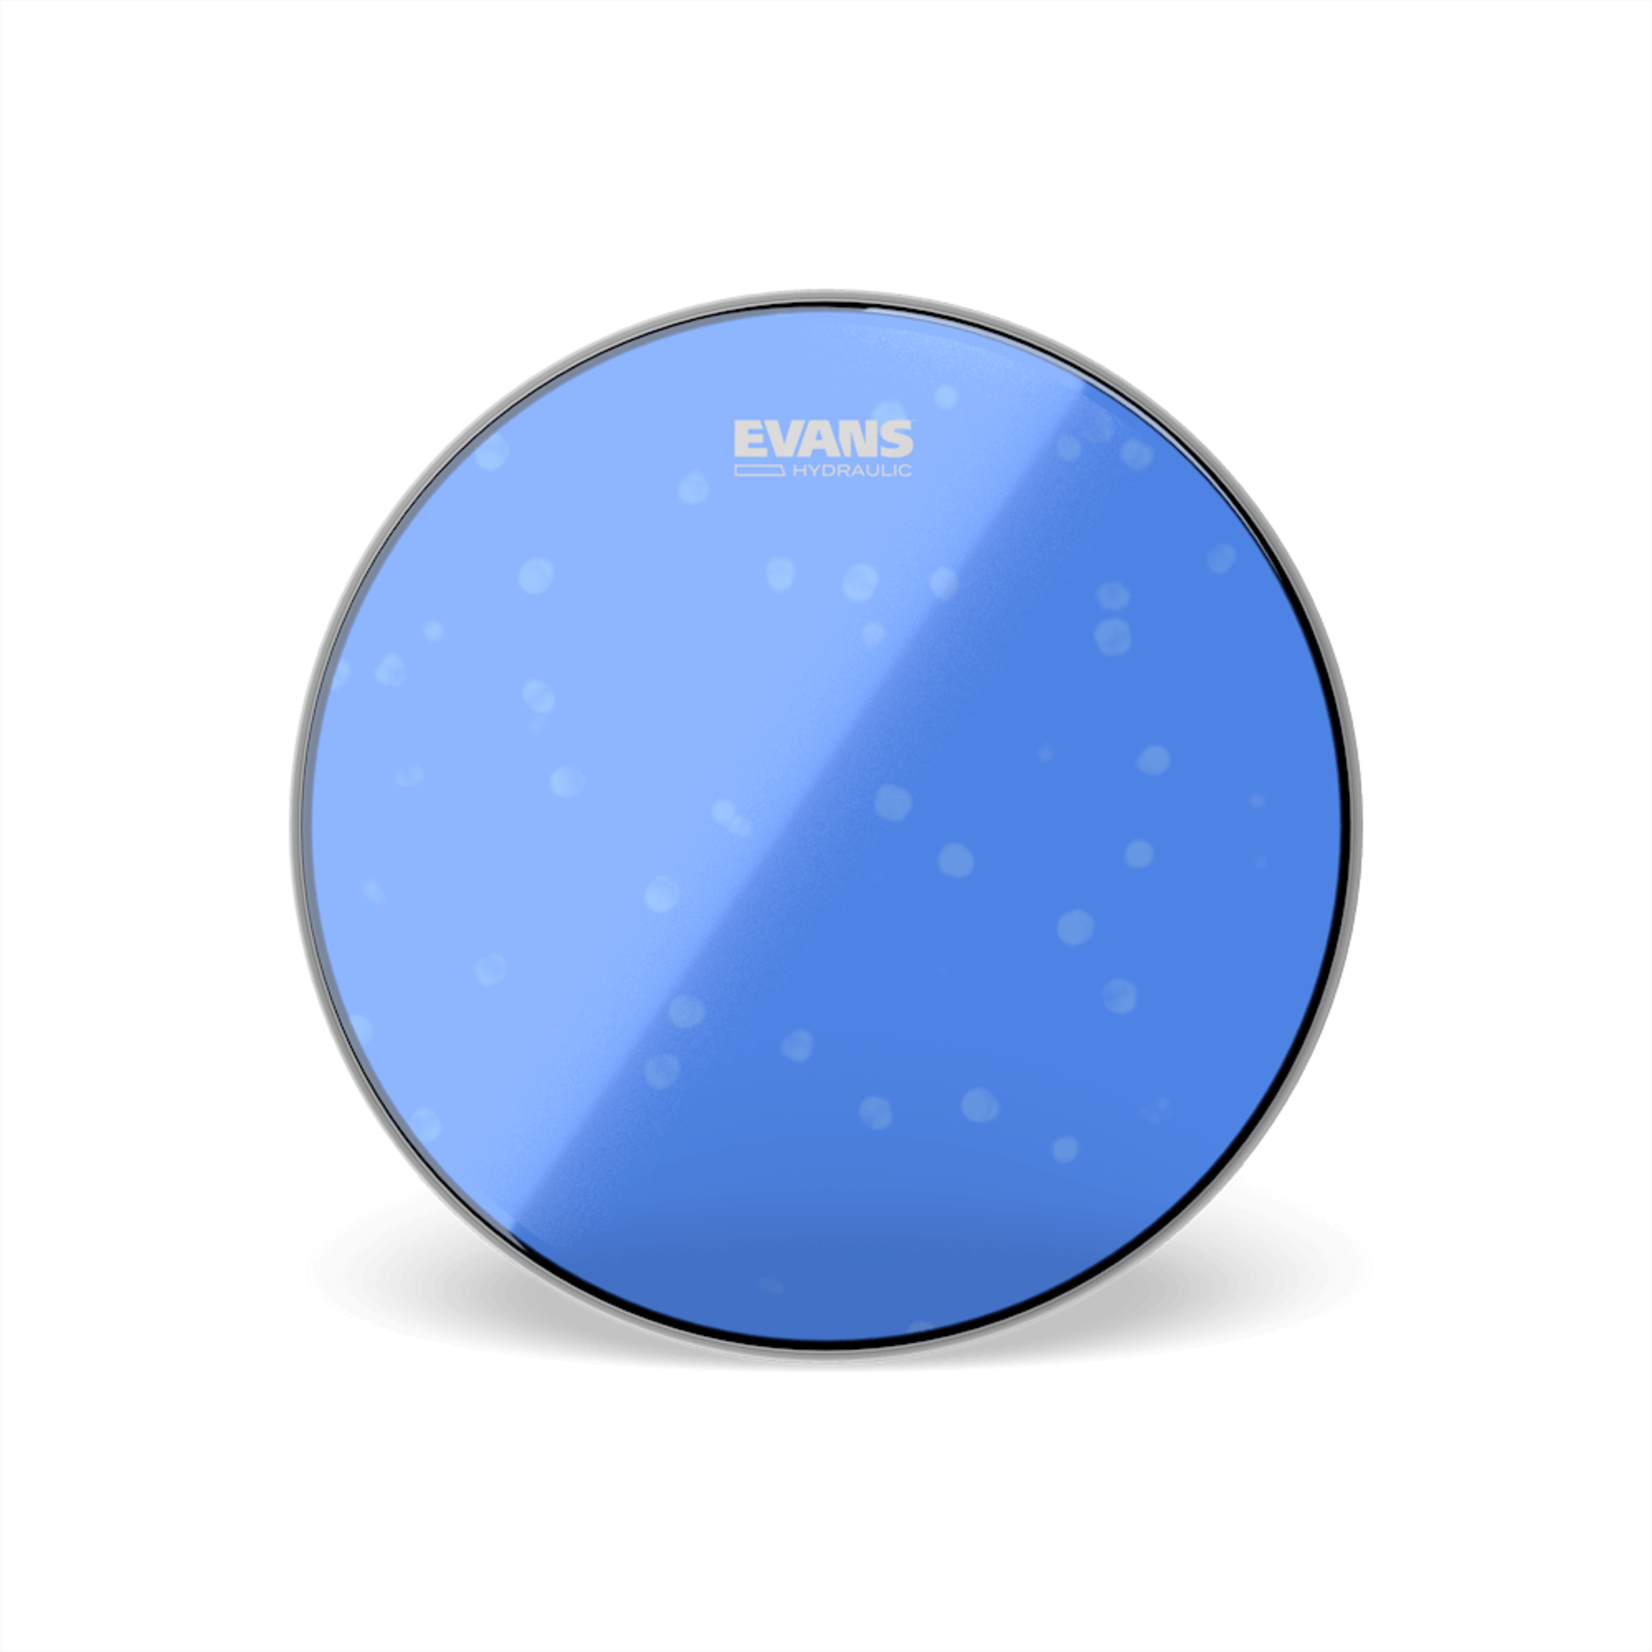 Evans EVANS HYDRAULIC BLUE